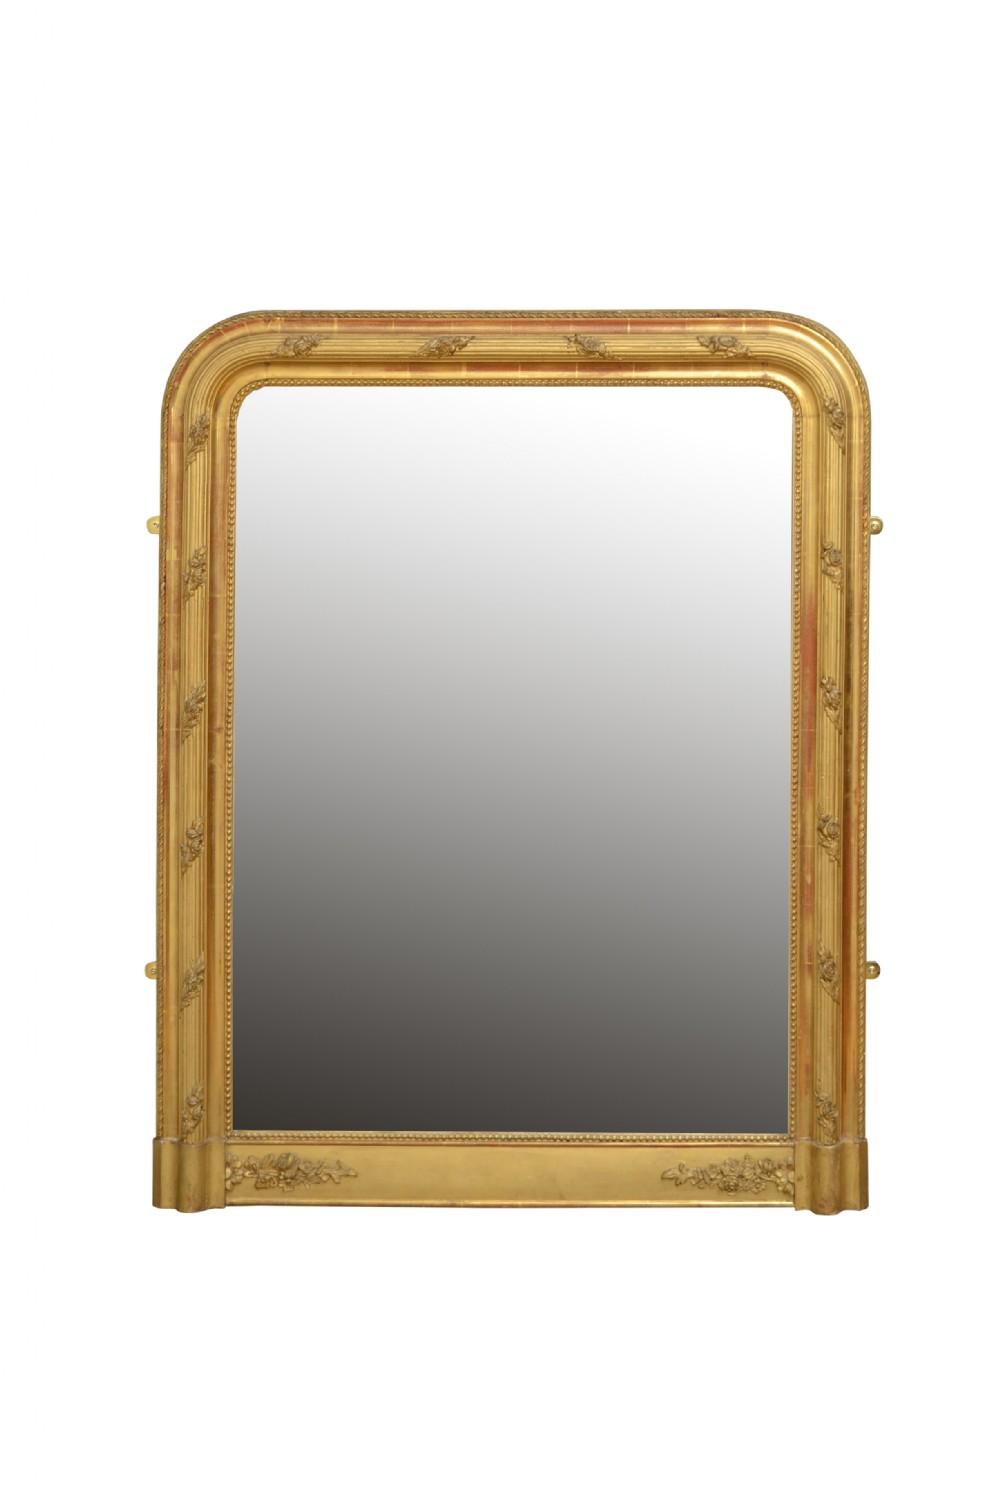 19th century french pier mirror gilt